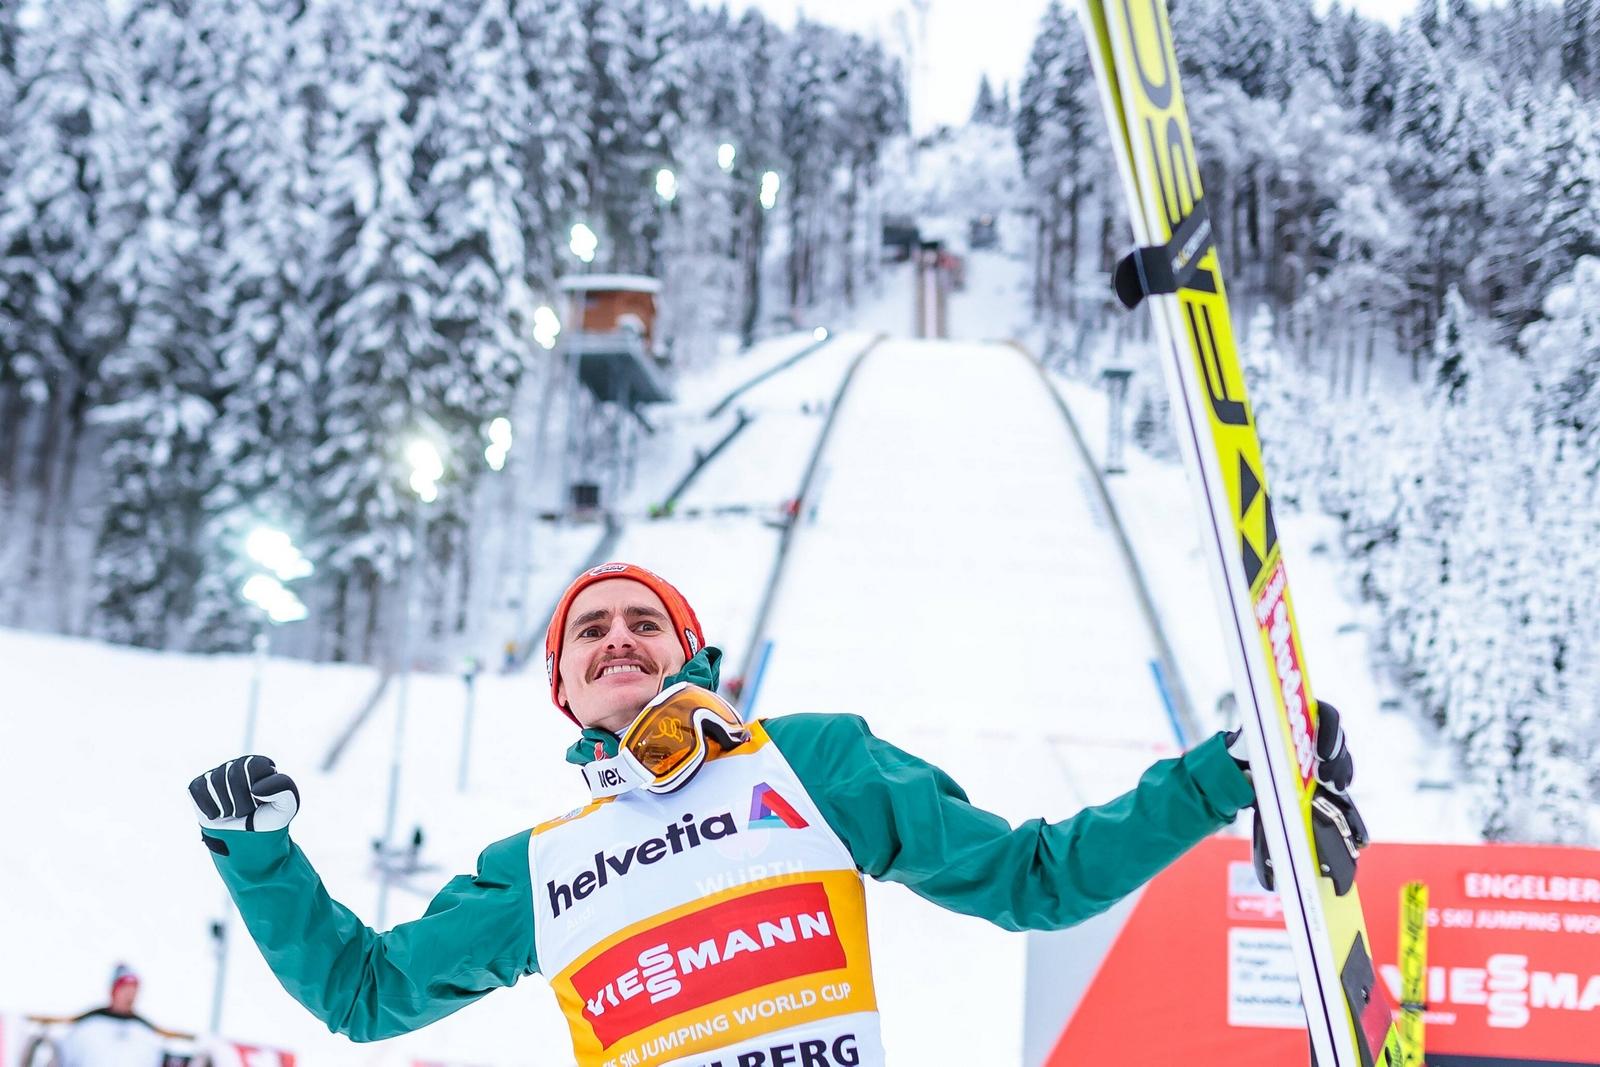 Skispringer Richard Freitag